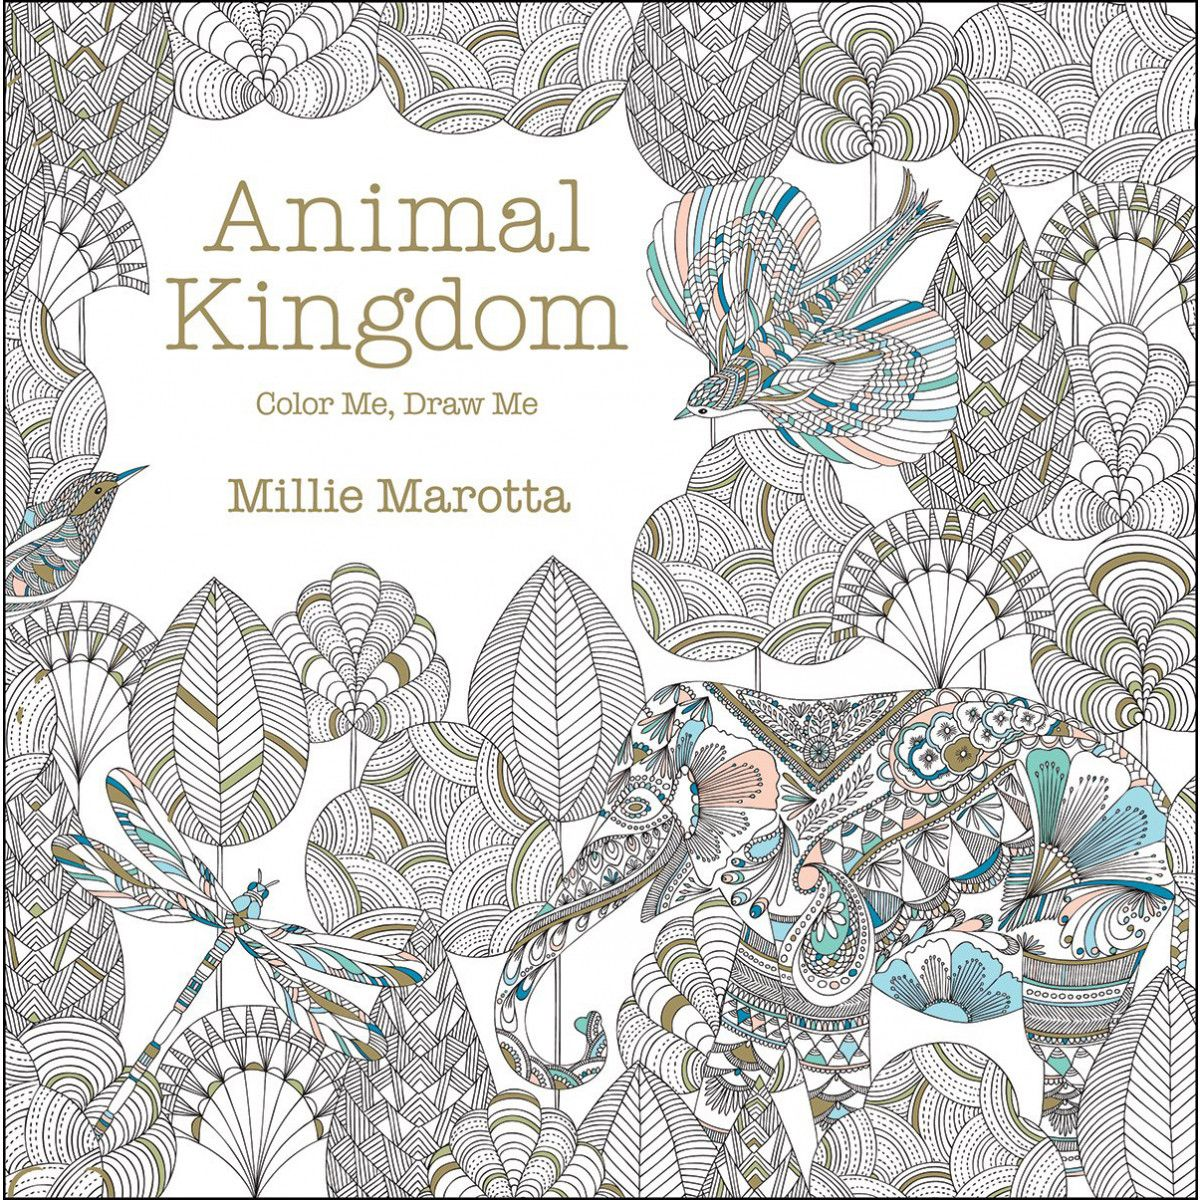 Animal Kingdom Coloring Sheet - Worksheet & Coloring Pages